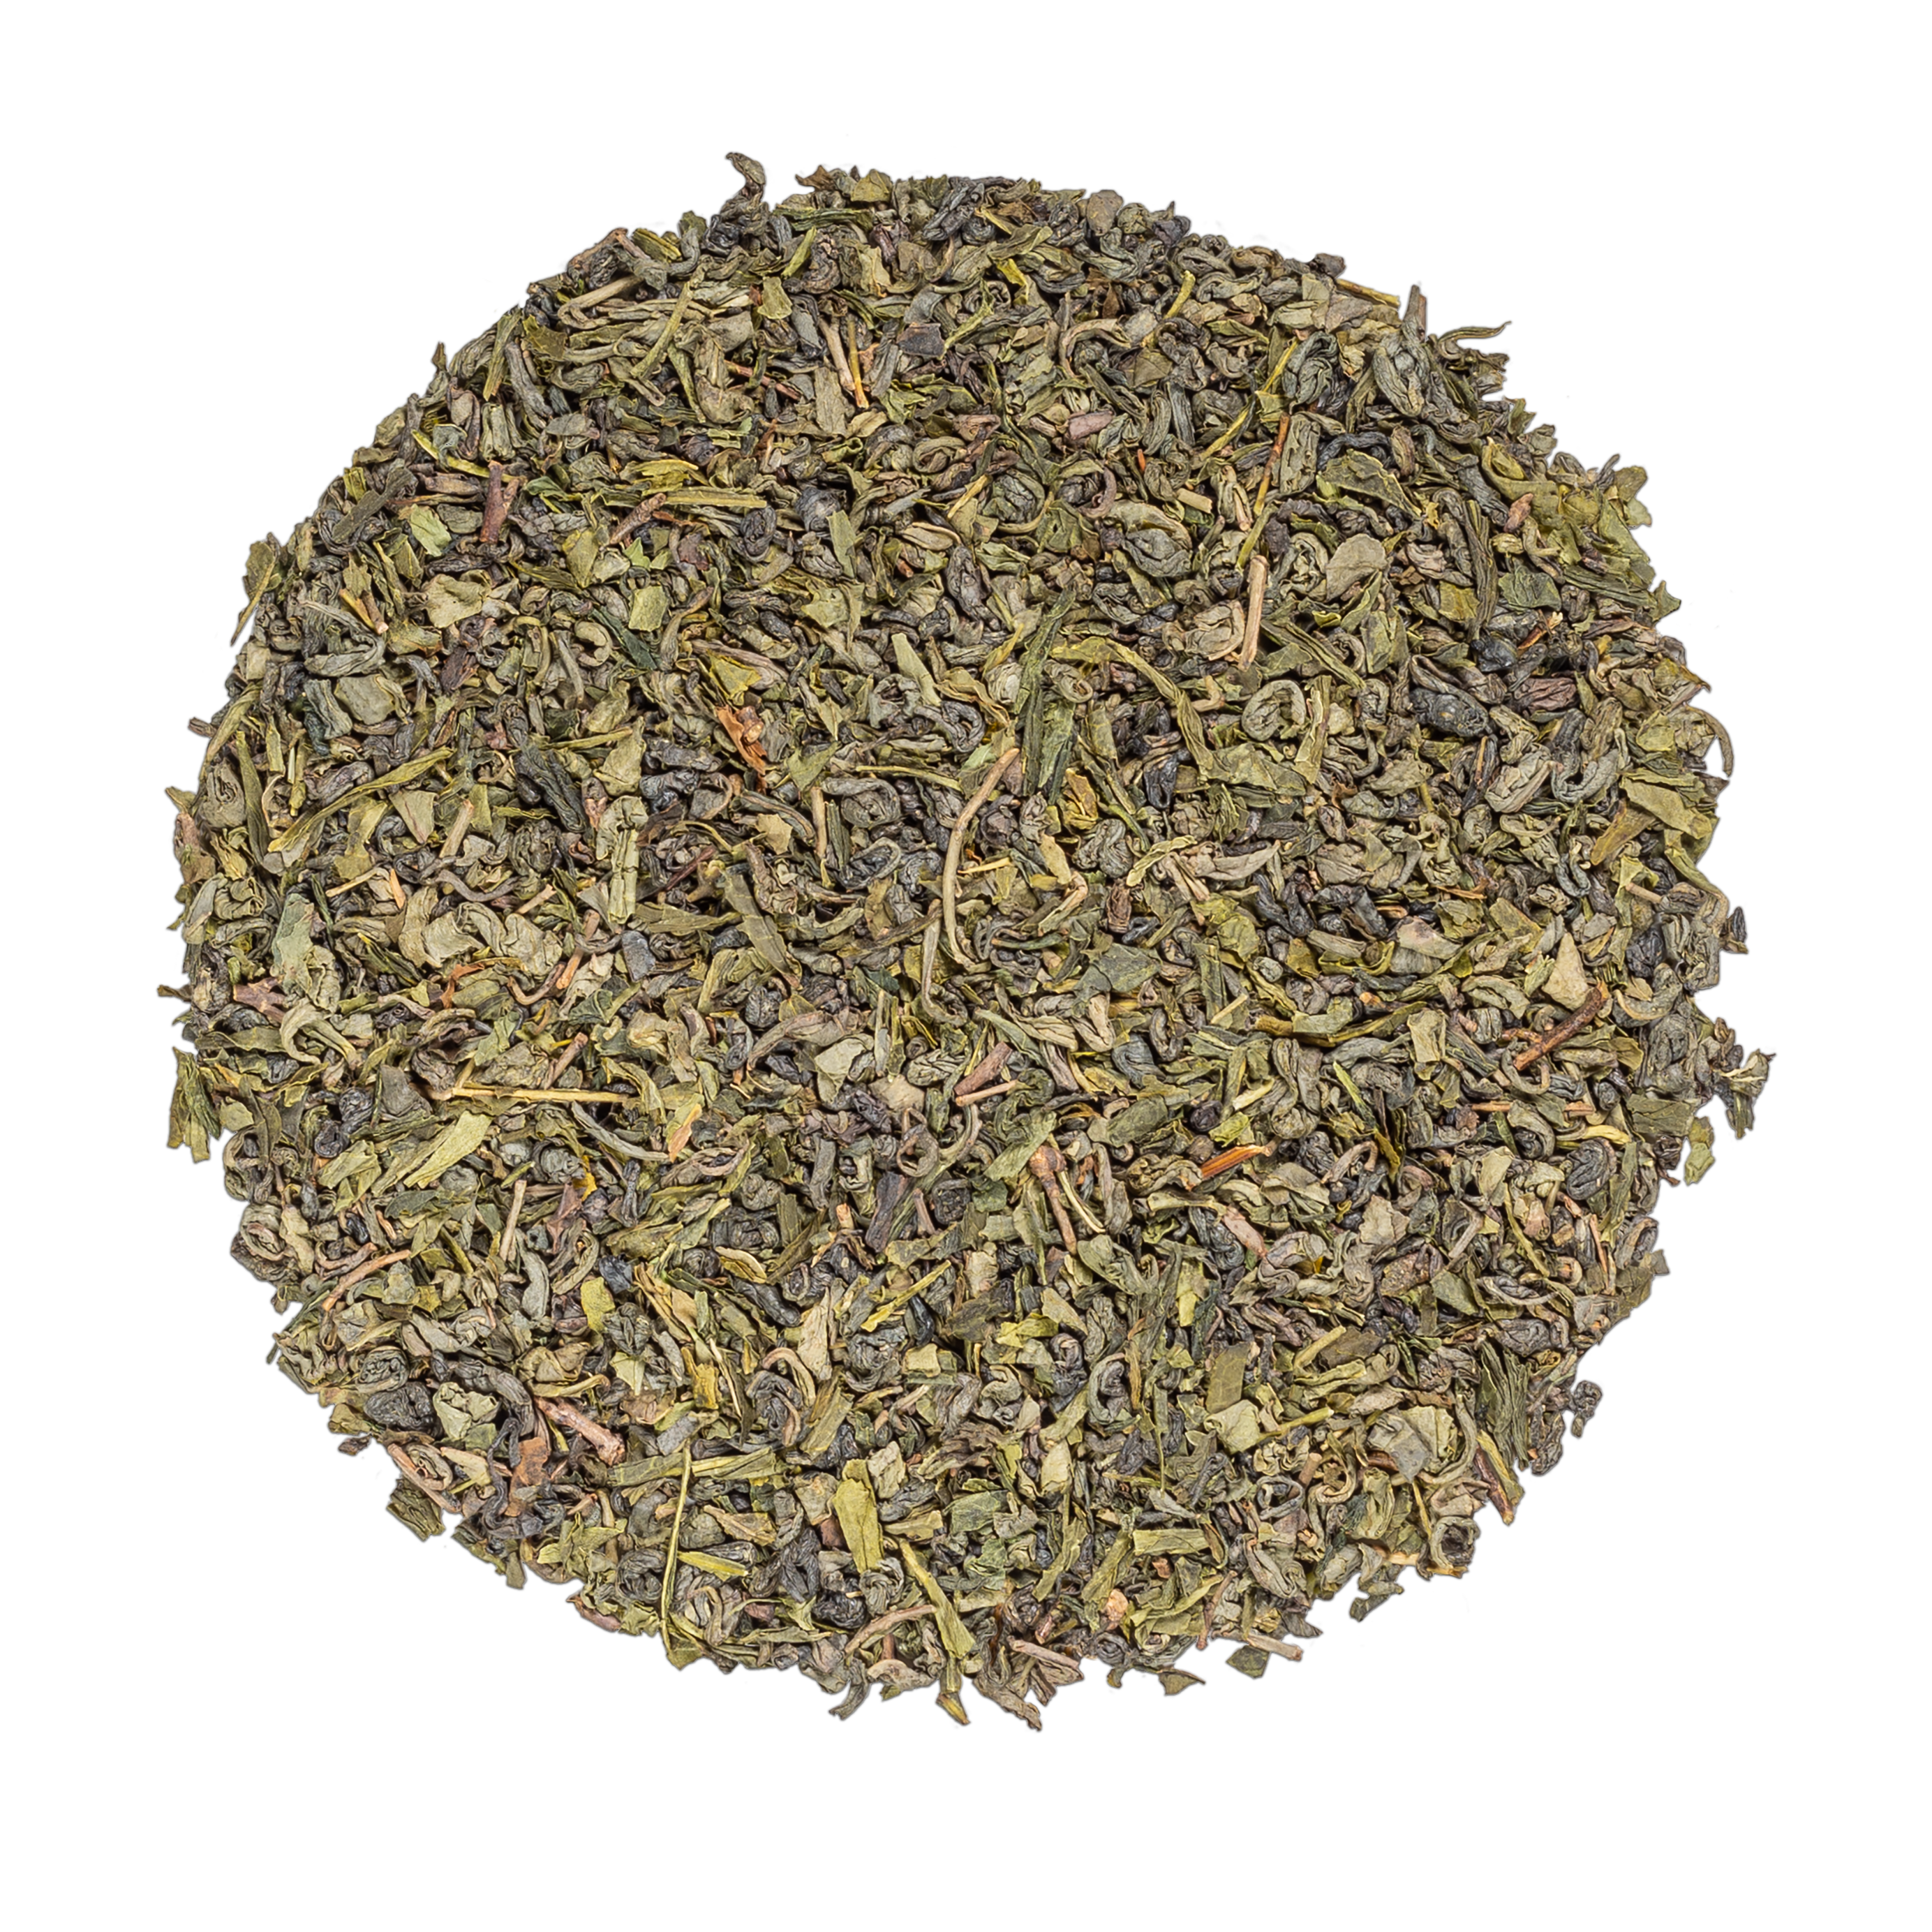 Thé vert - Thé vert à la menthe bio à l'arôme naturel de rose - Vrac - Kusmi Tea